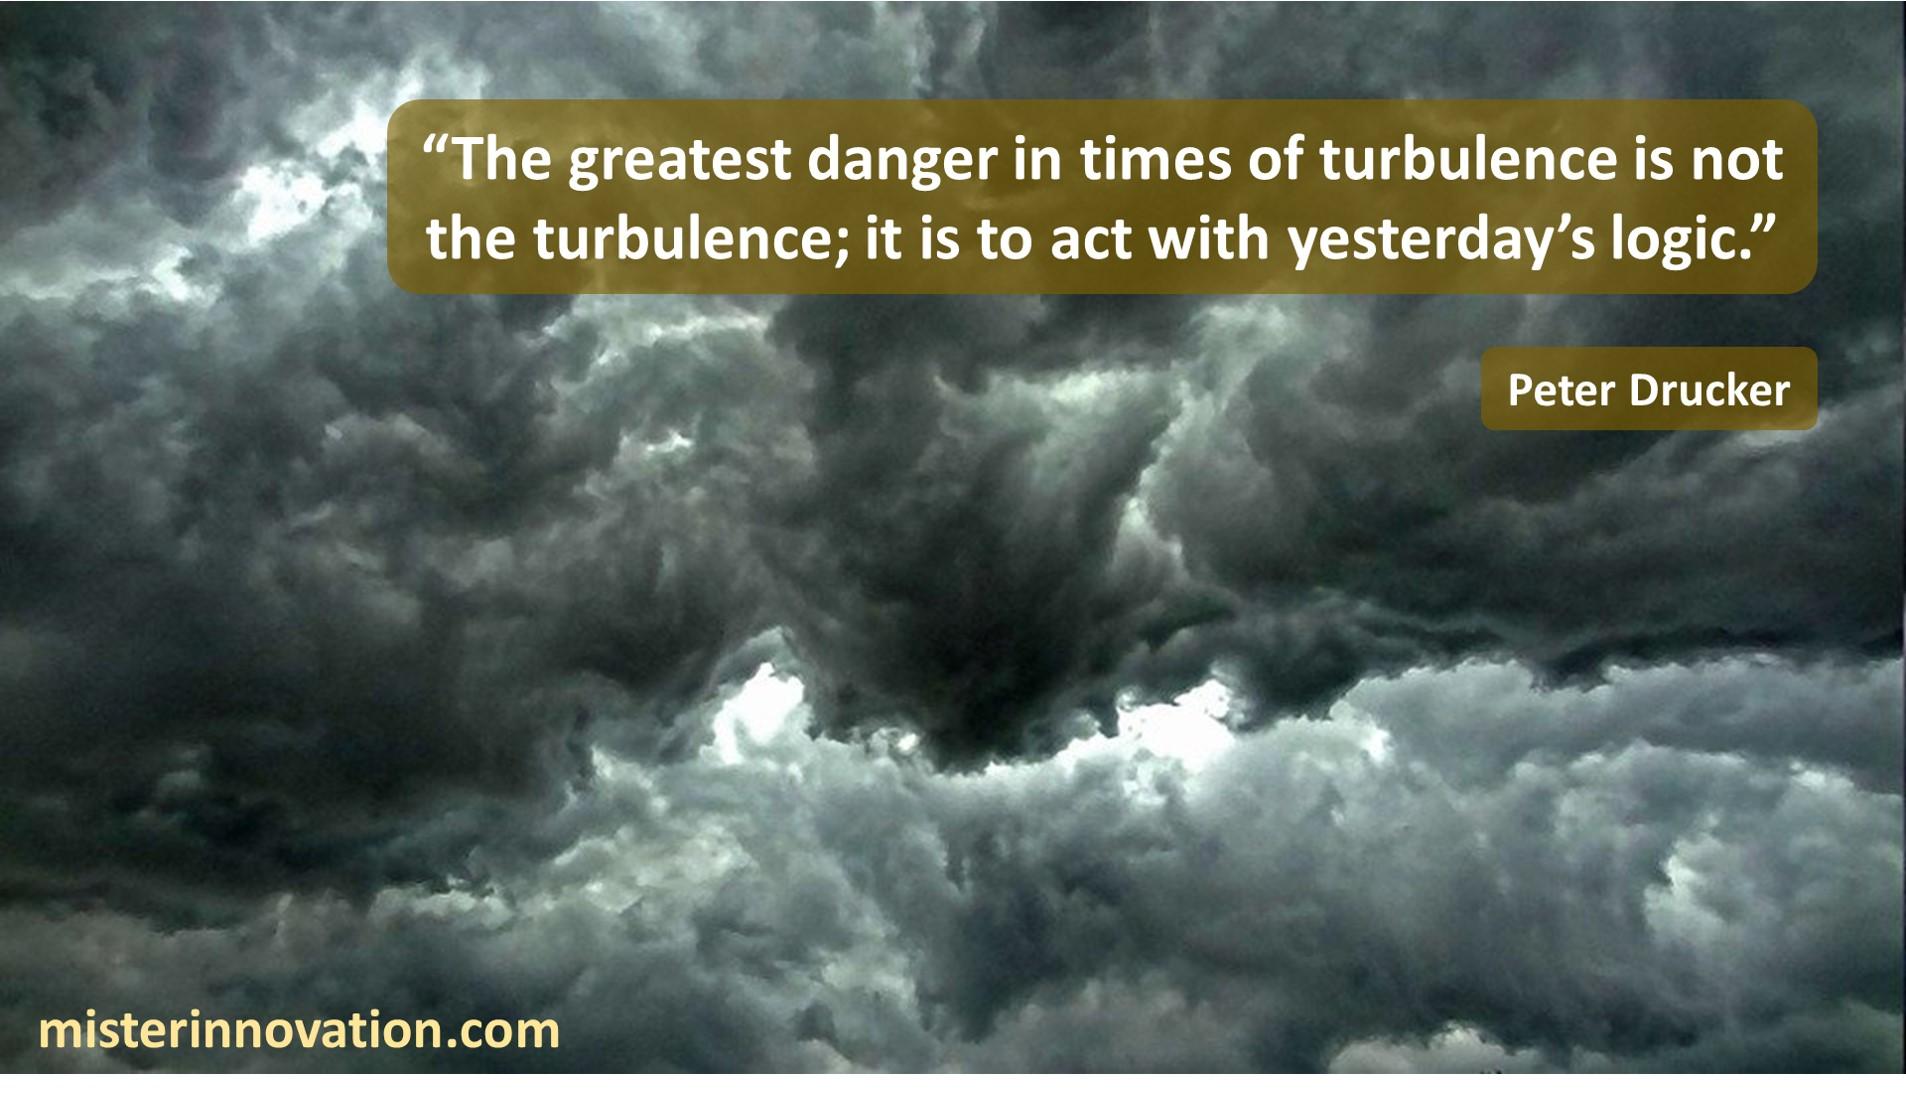 Peter Drucker Turbulence